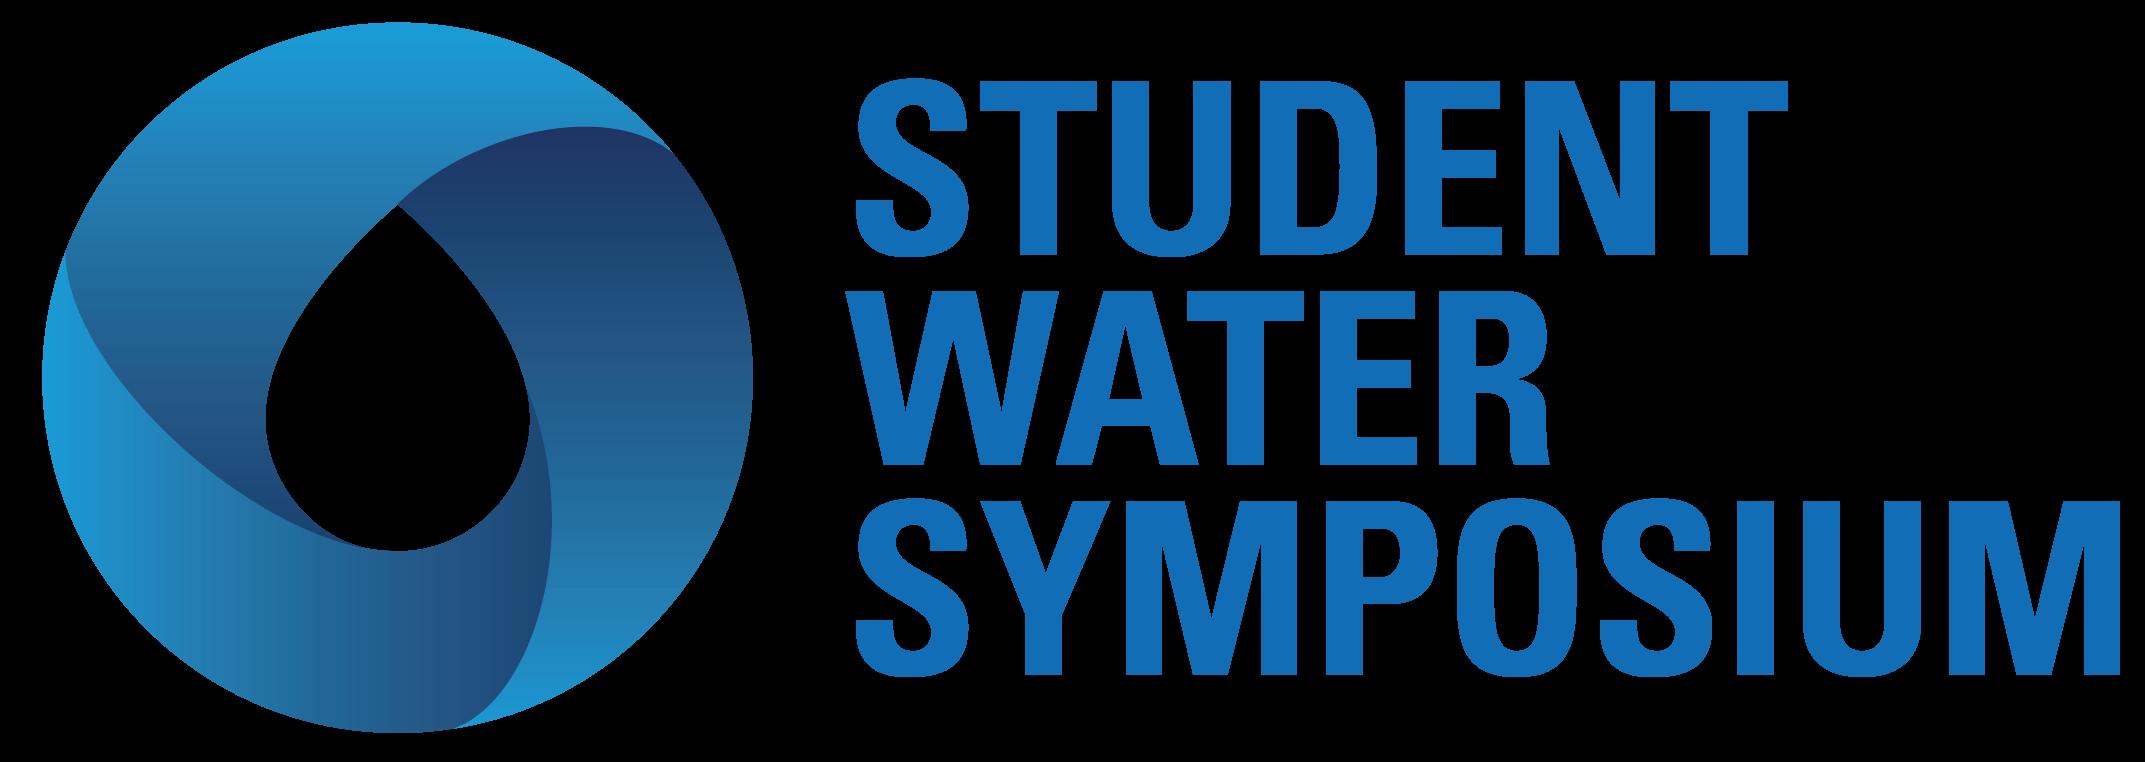 Student Water Symposium